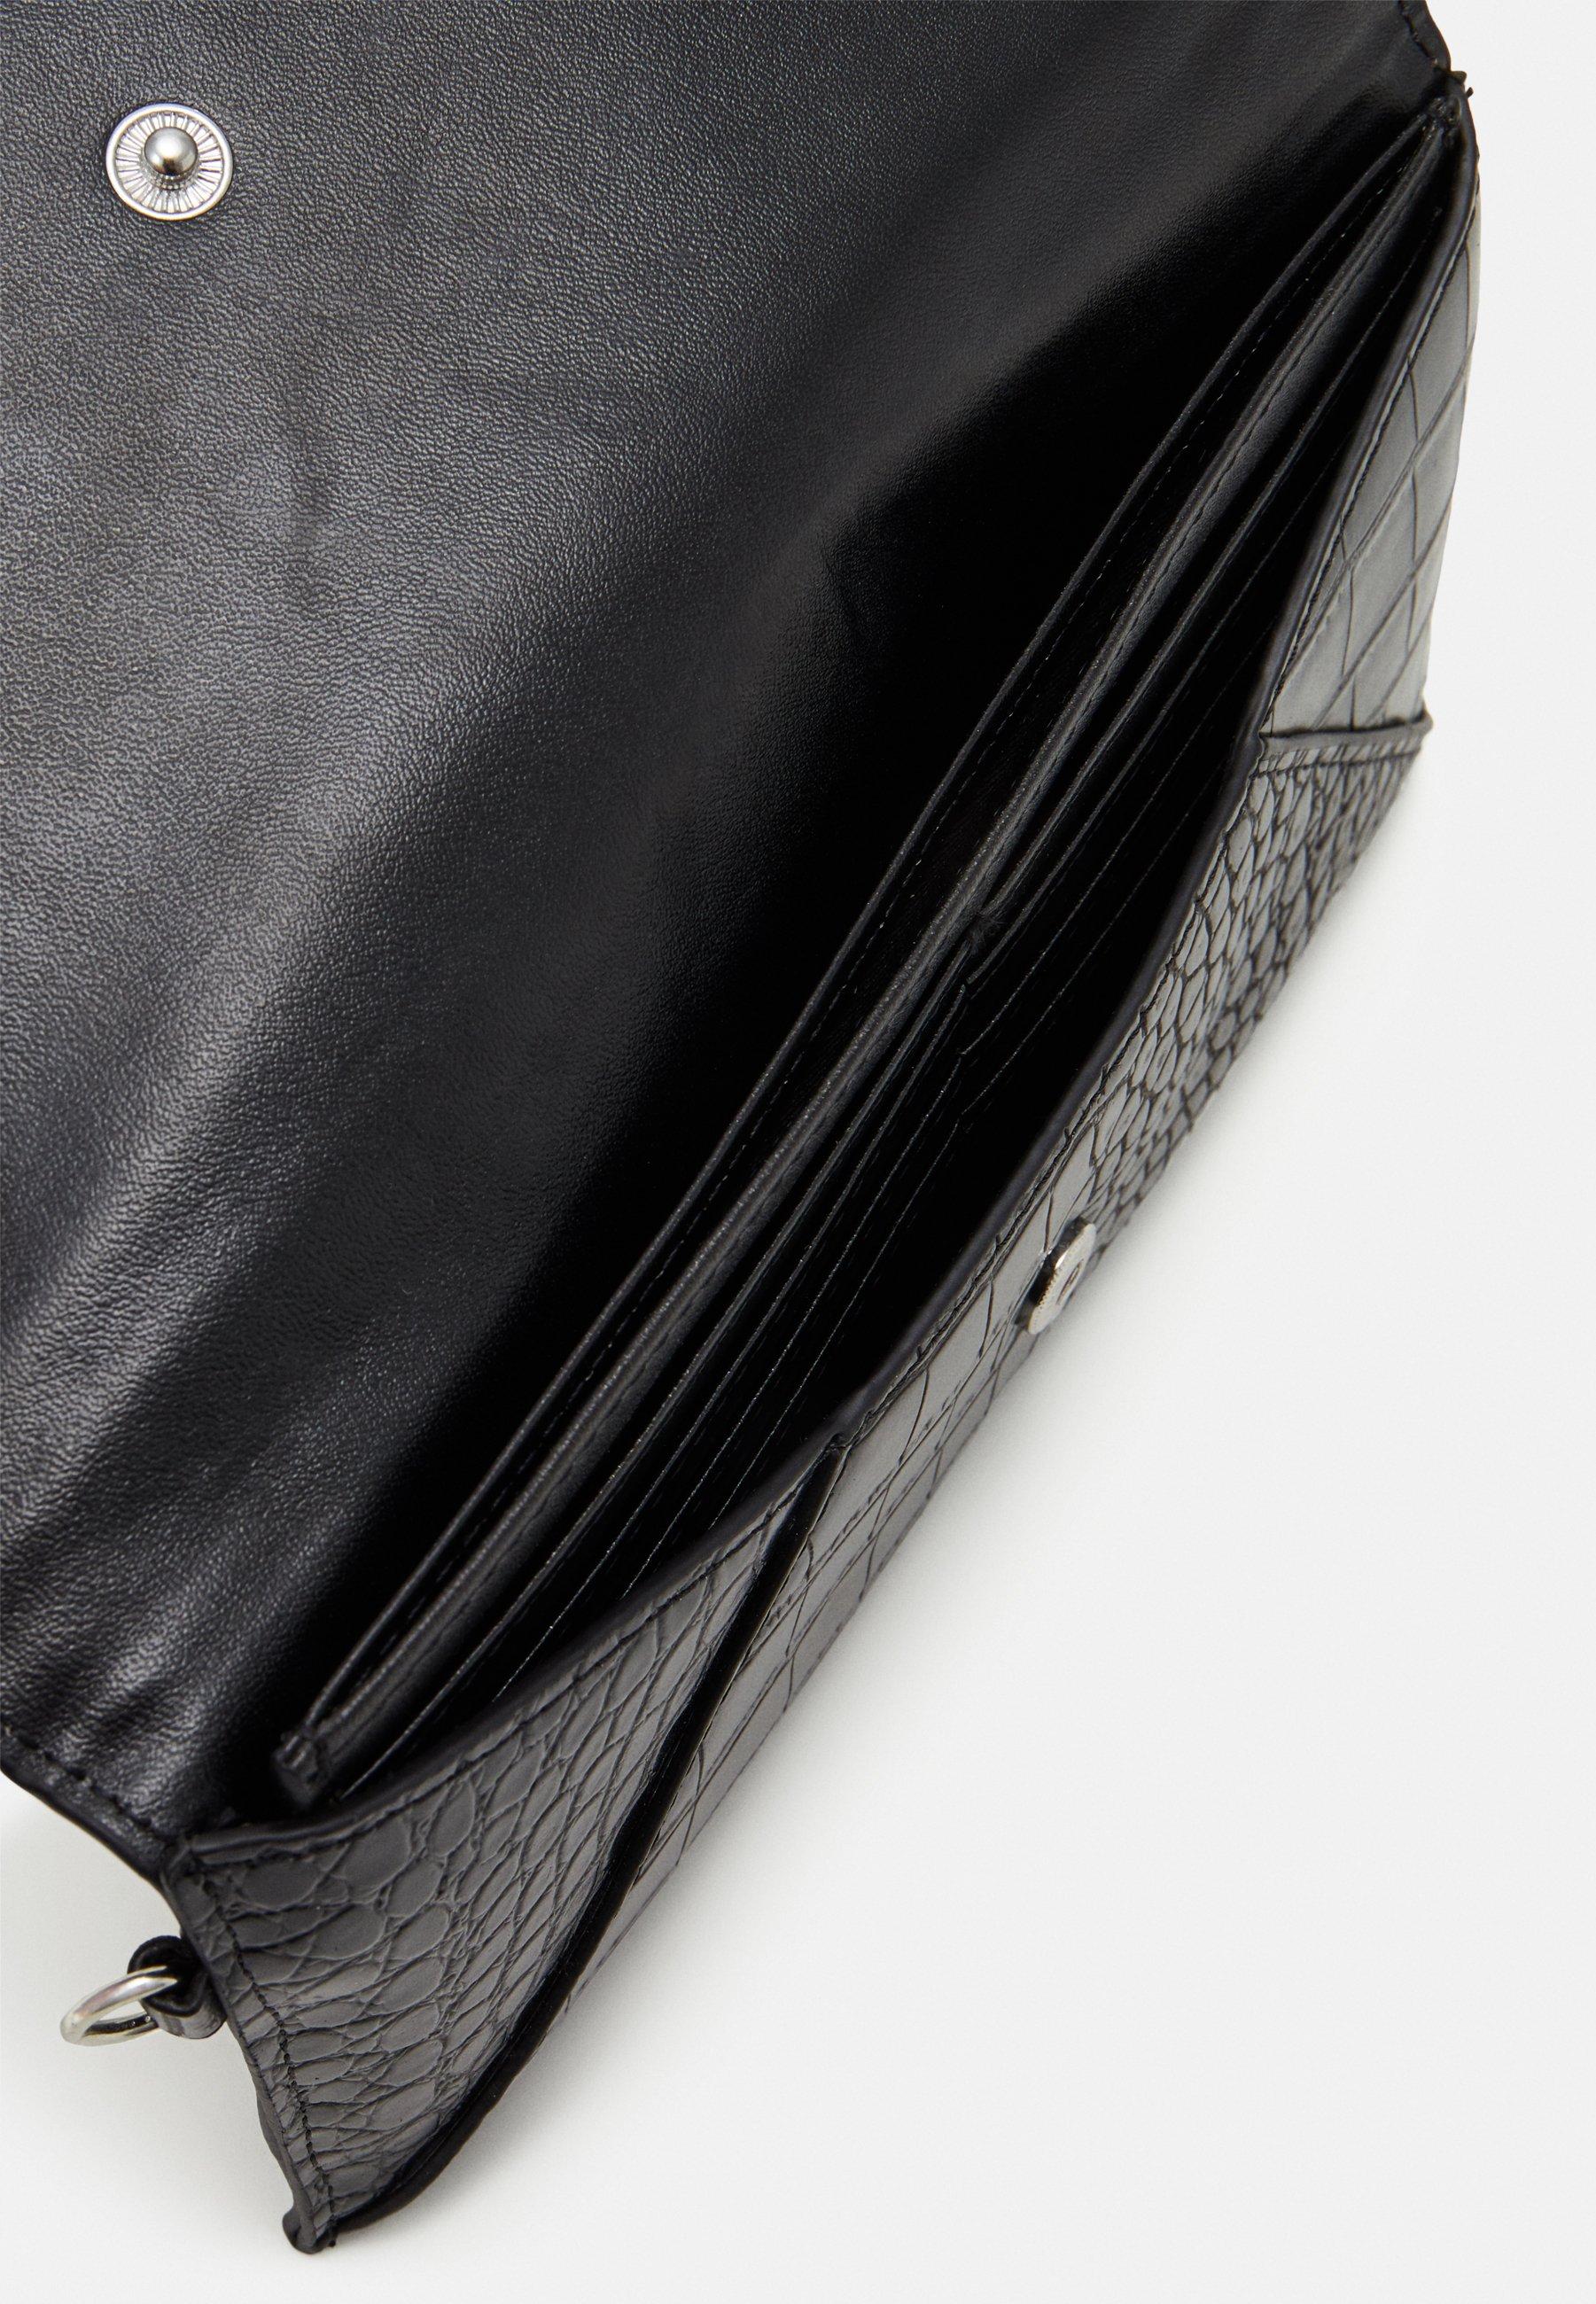 ALDO ELIZABETA - Lommebok - jet black/silver-coloured/svart Yfo1oW17bzptvAK